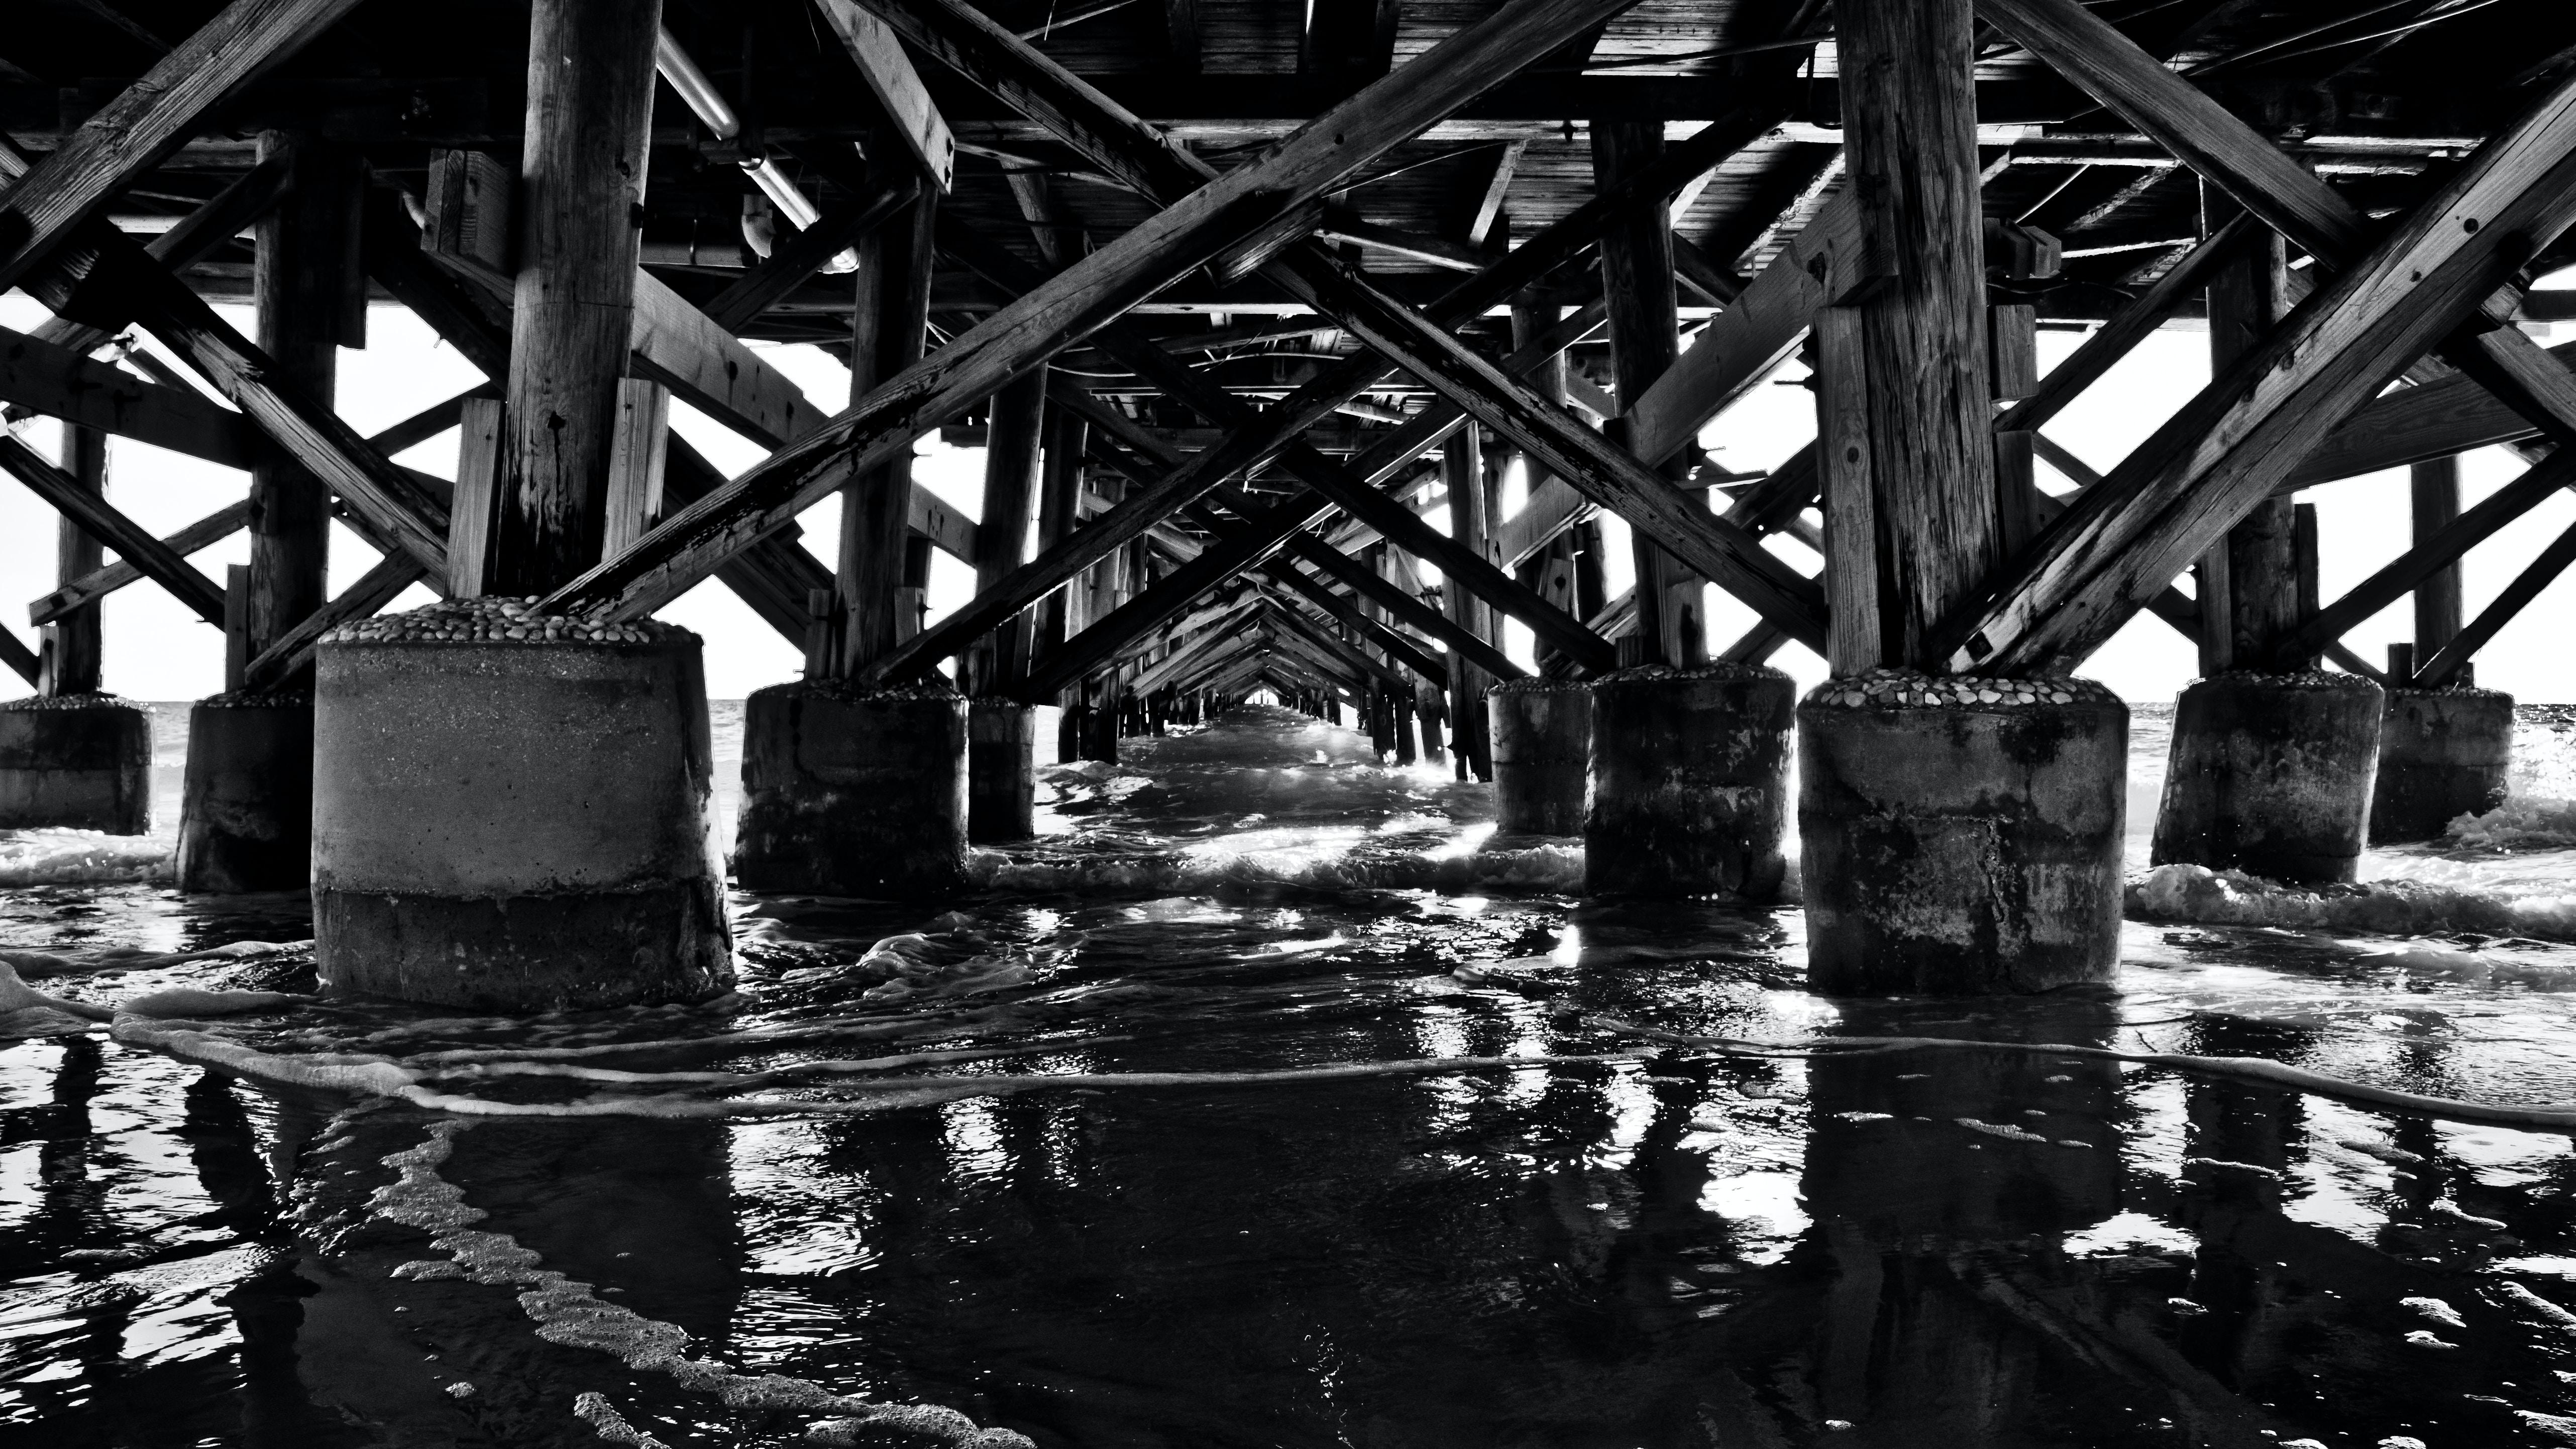 Free Unsplash photo from Timon Studler